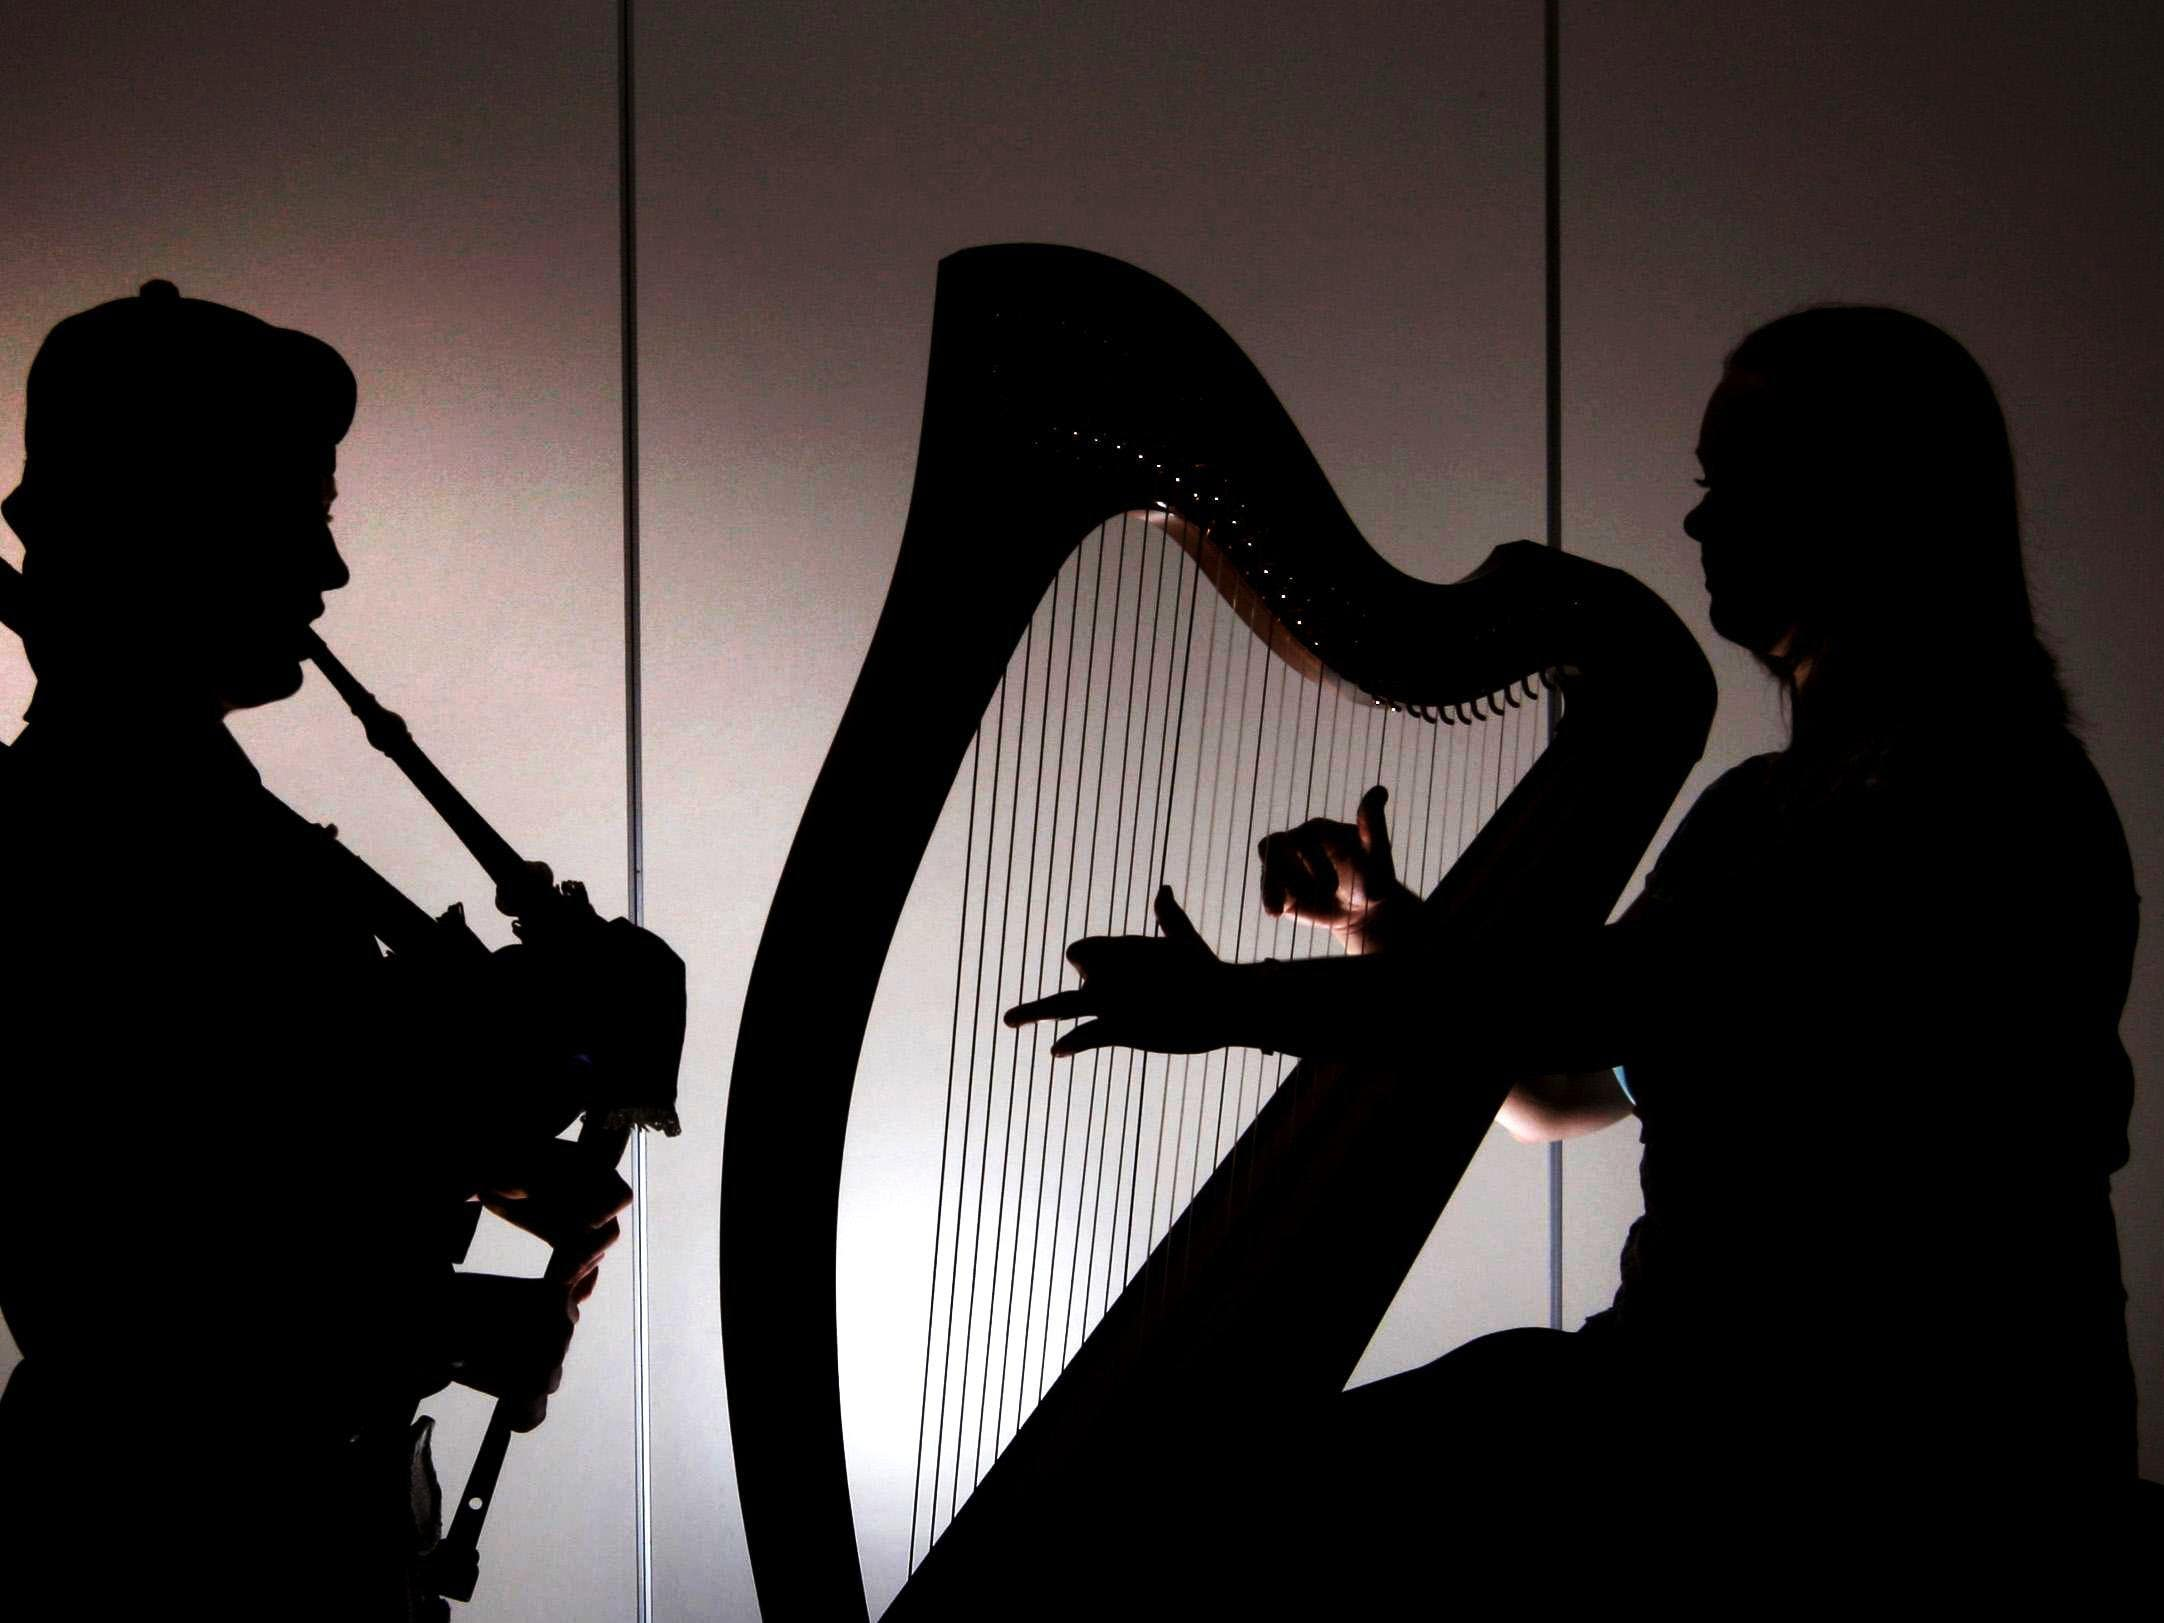 2.7m education boost for Gaelic language